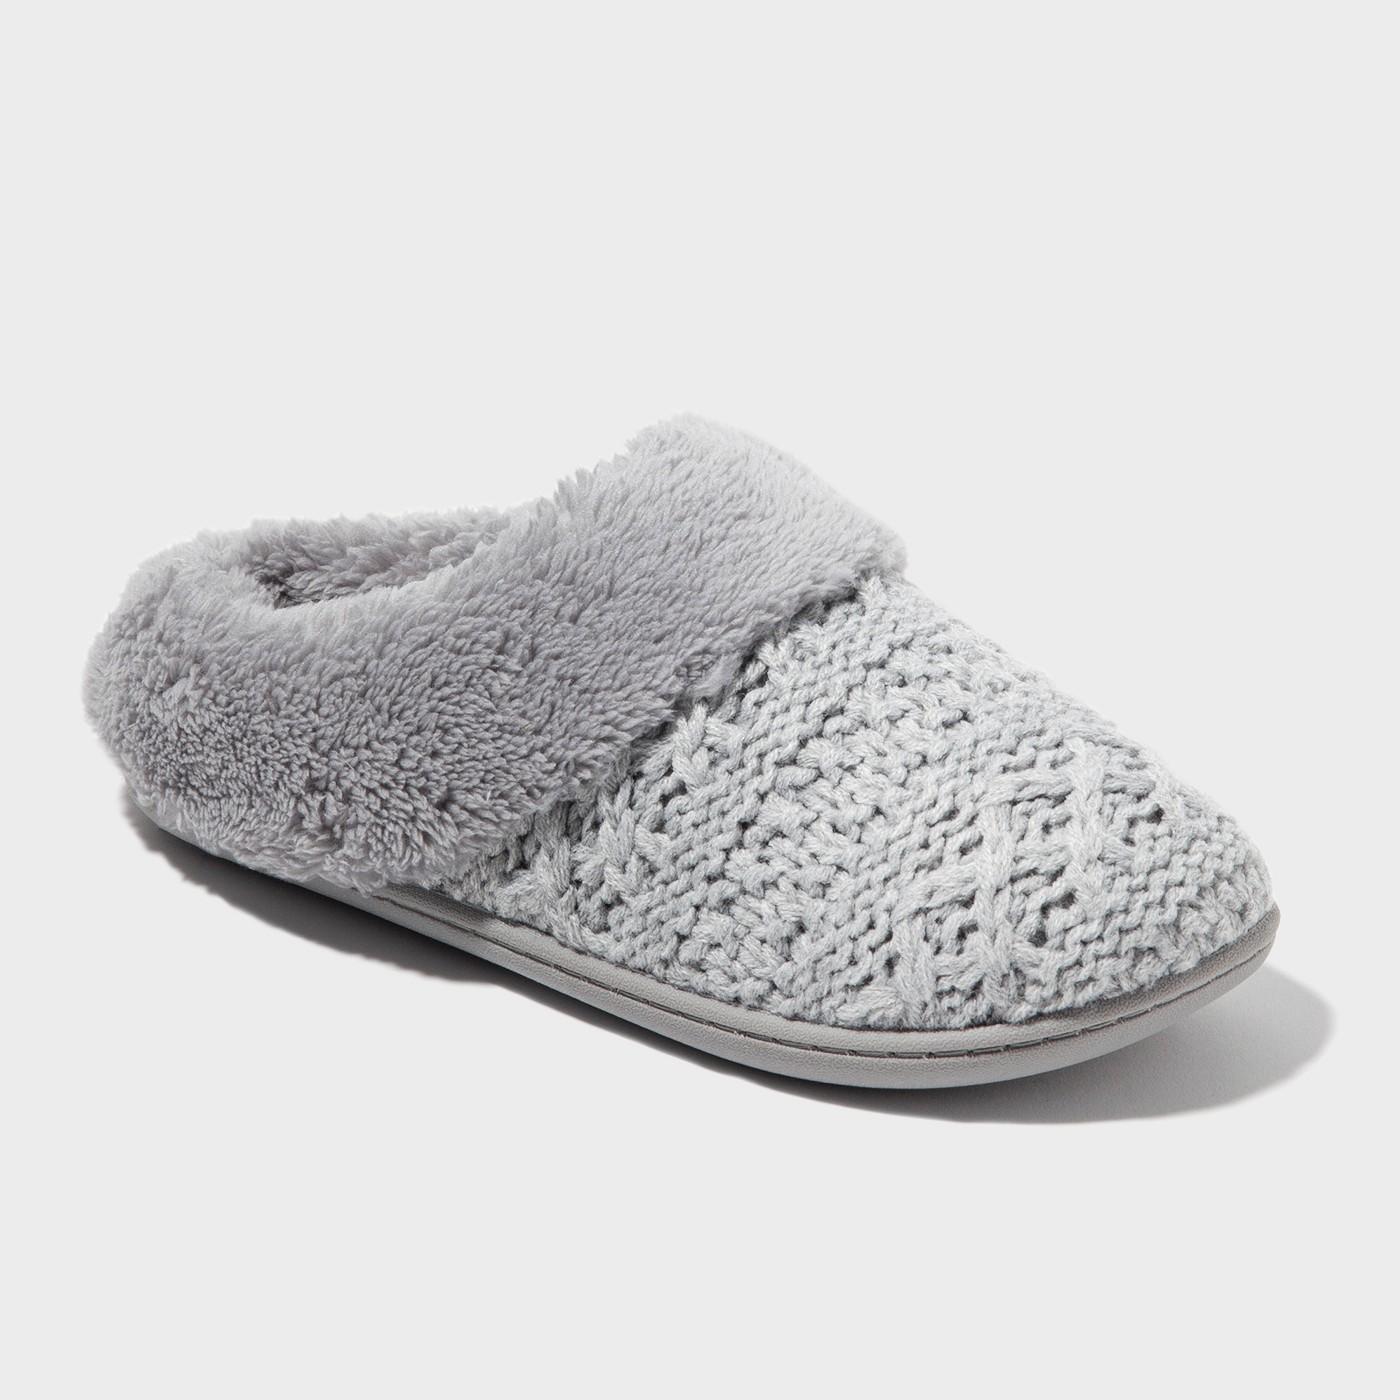 Cozy, gray women\'s slippers.